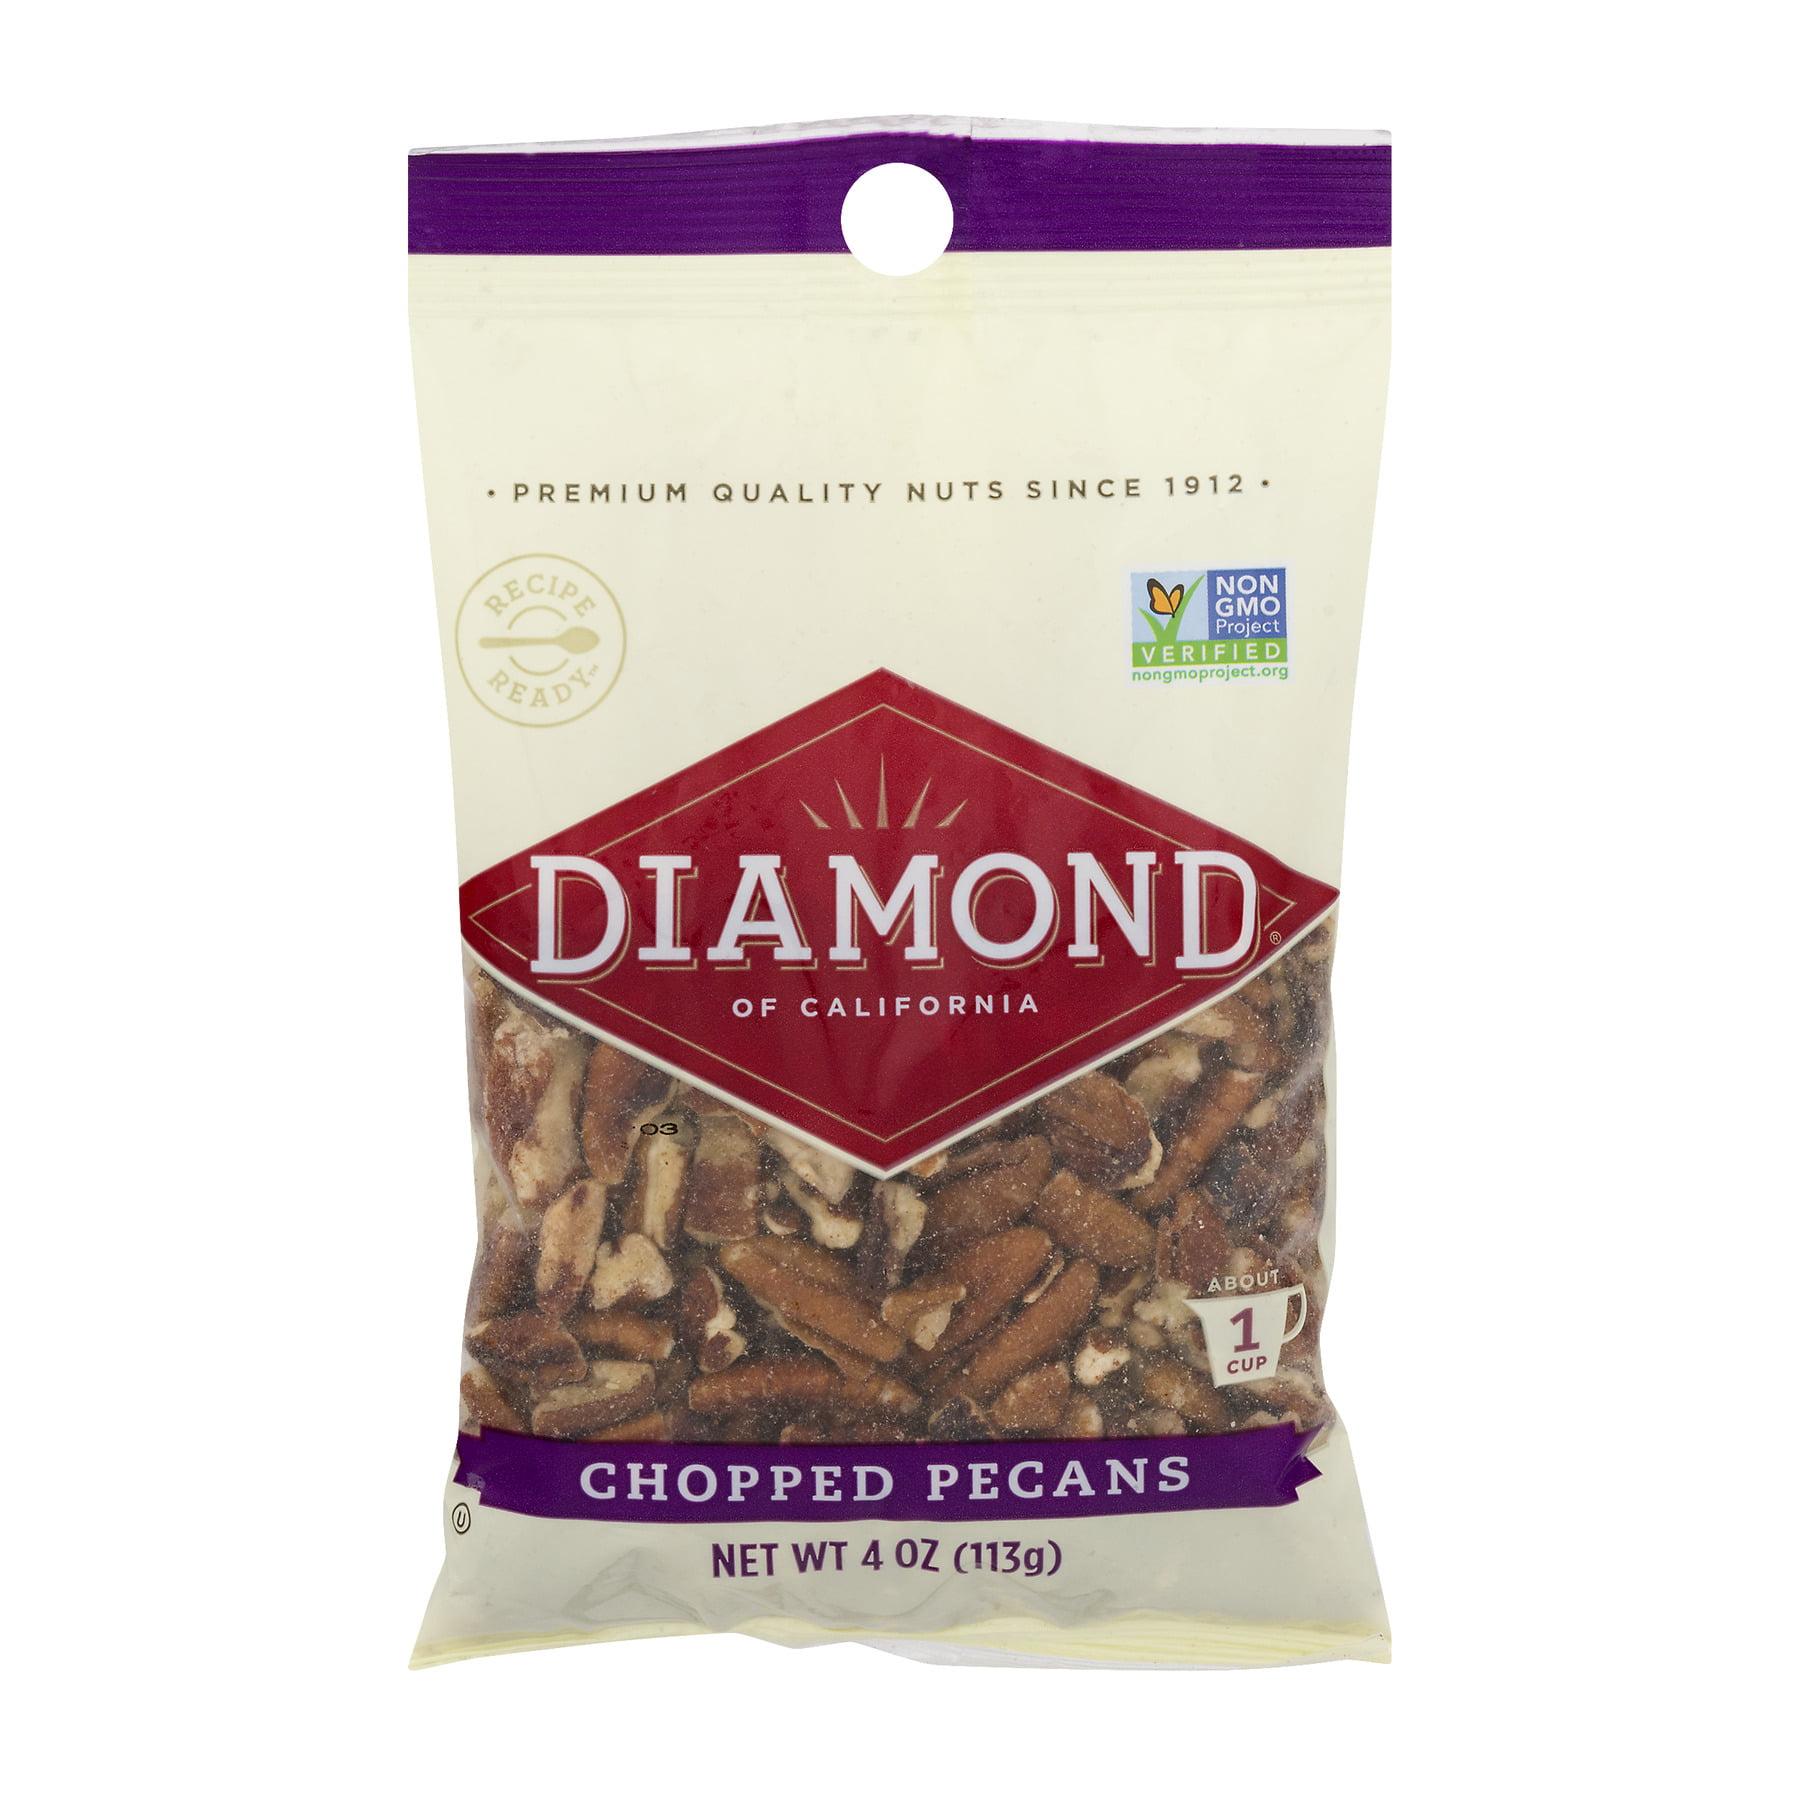 (3 Pack) Diamond Of California: Chopped Pecans, 4 oz